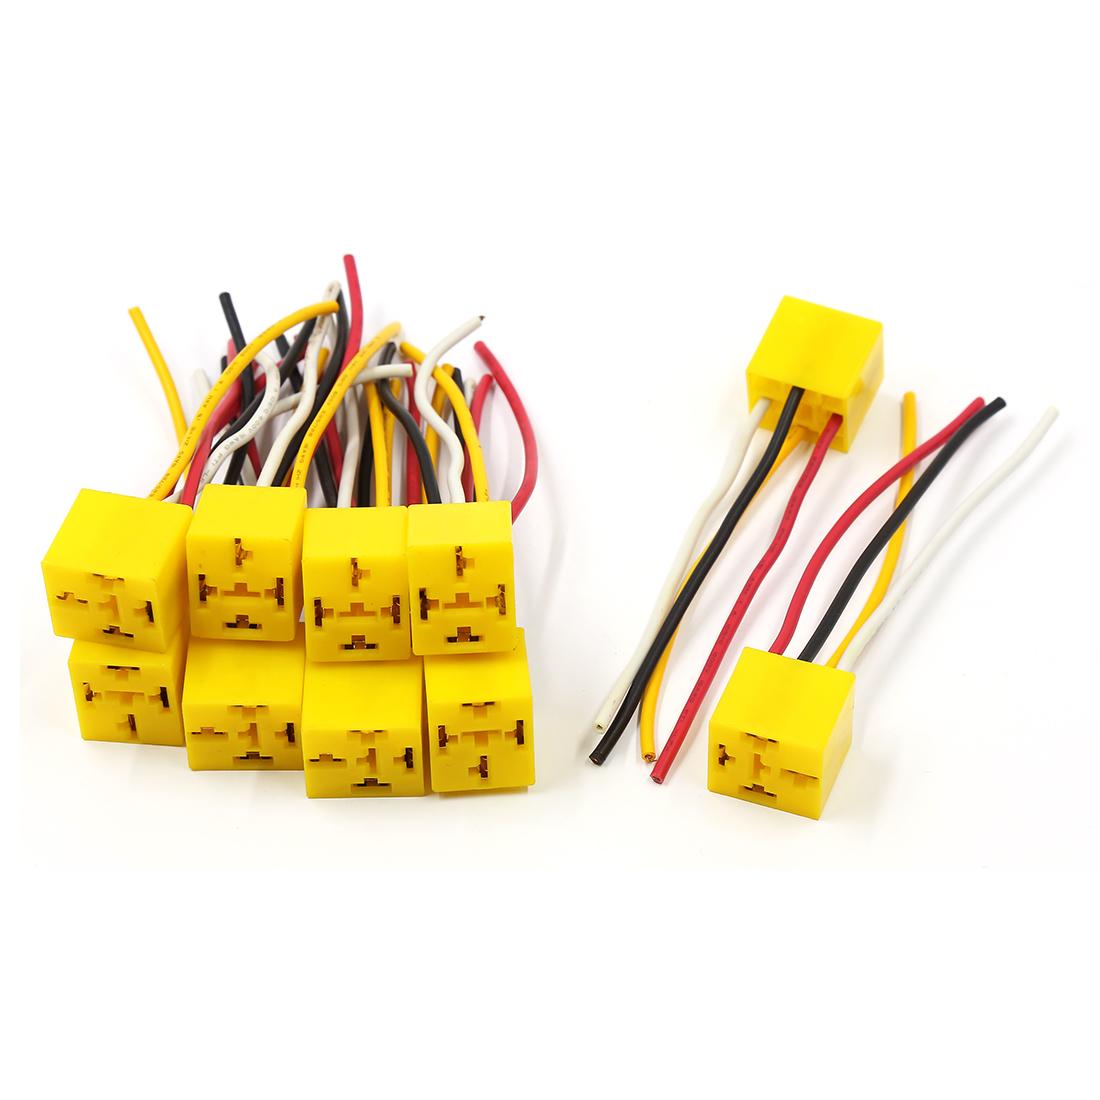 DC 12V 4 Pins 4 Wires Auto Car Relay Socket Harness Connector 10 Pcs